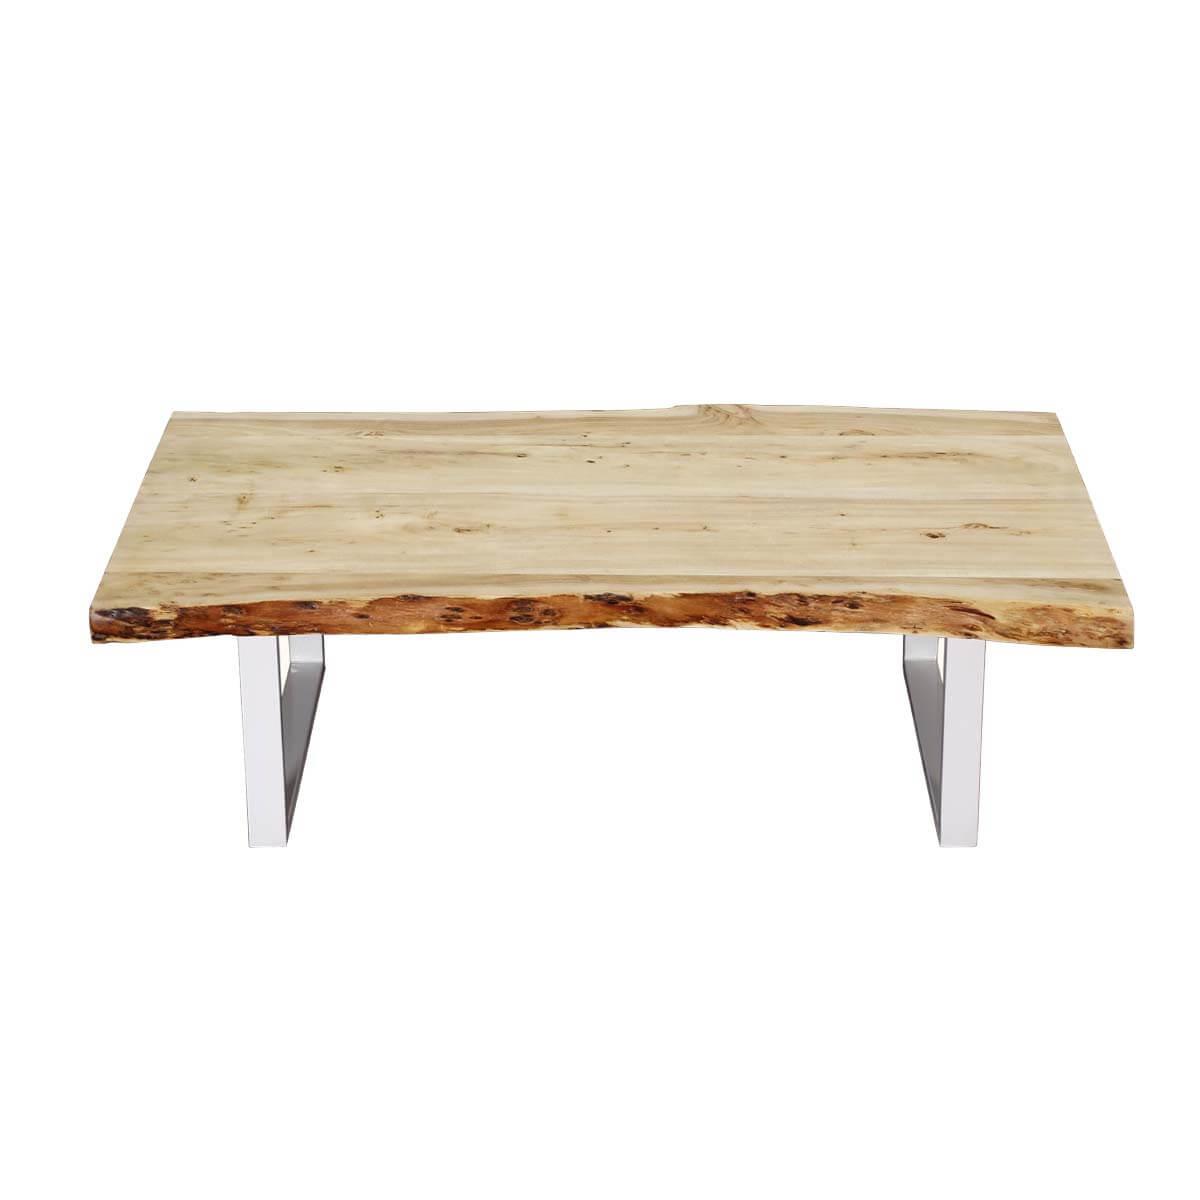 Natural 51 Acacia Wood Polished Iron Live Edge Coffee Table